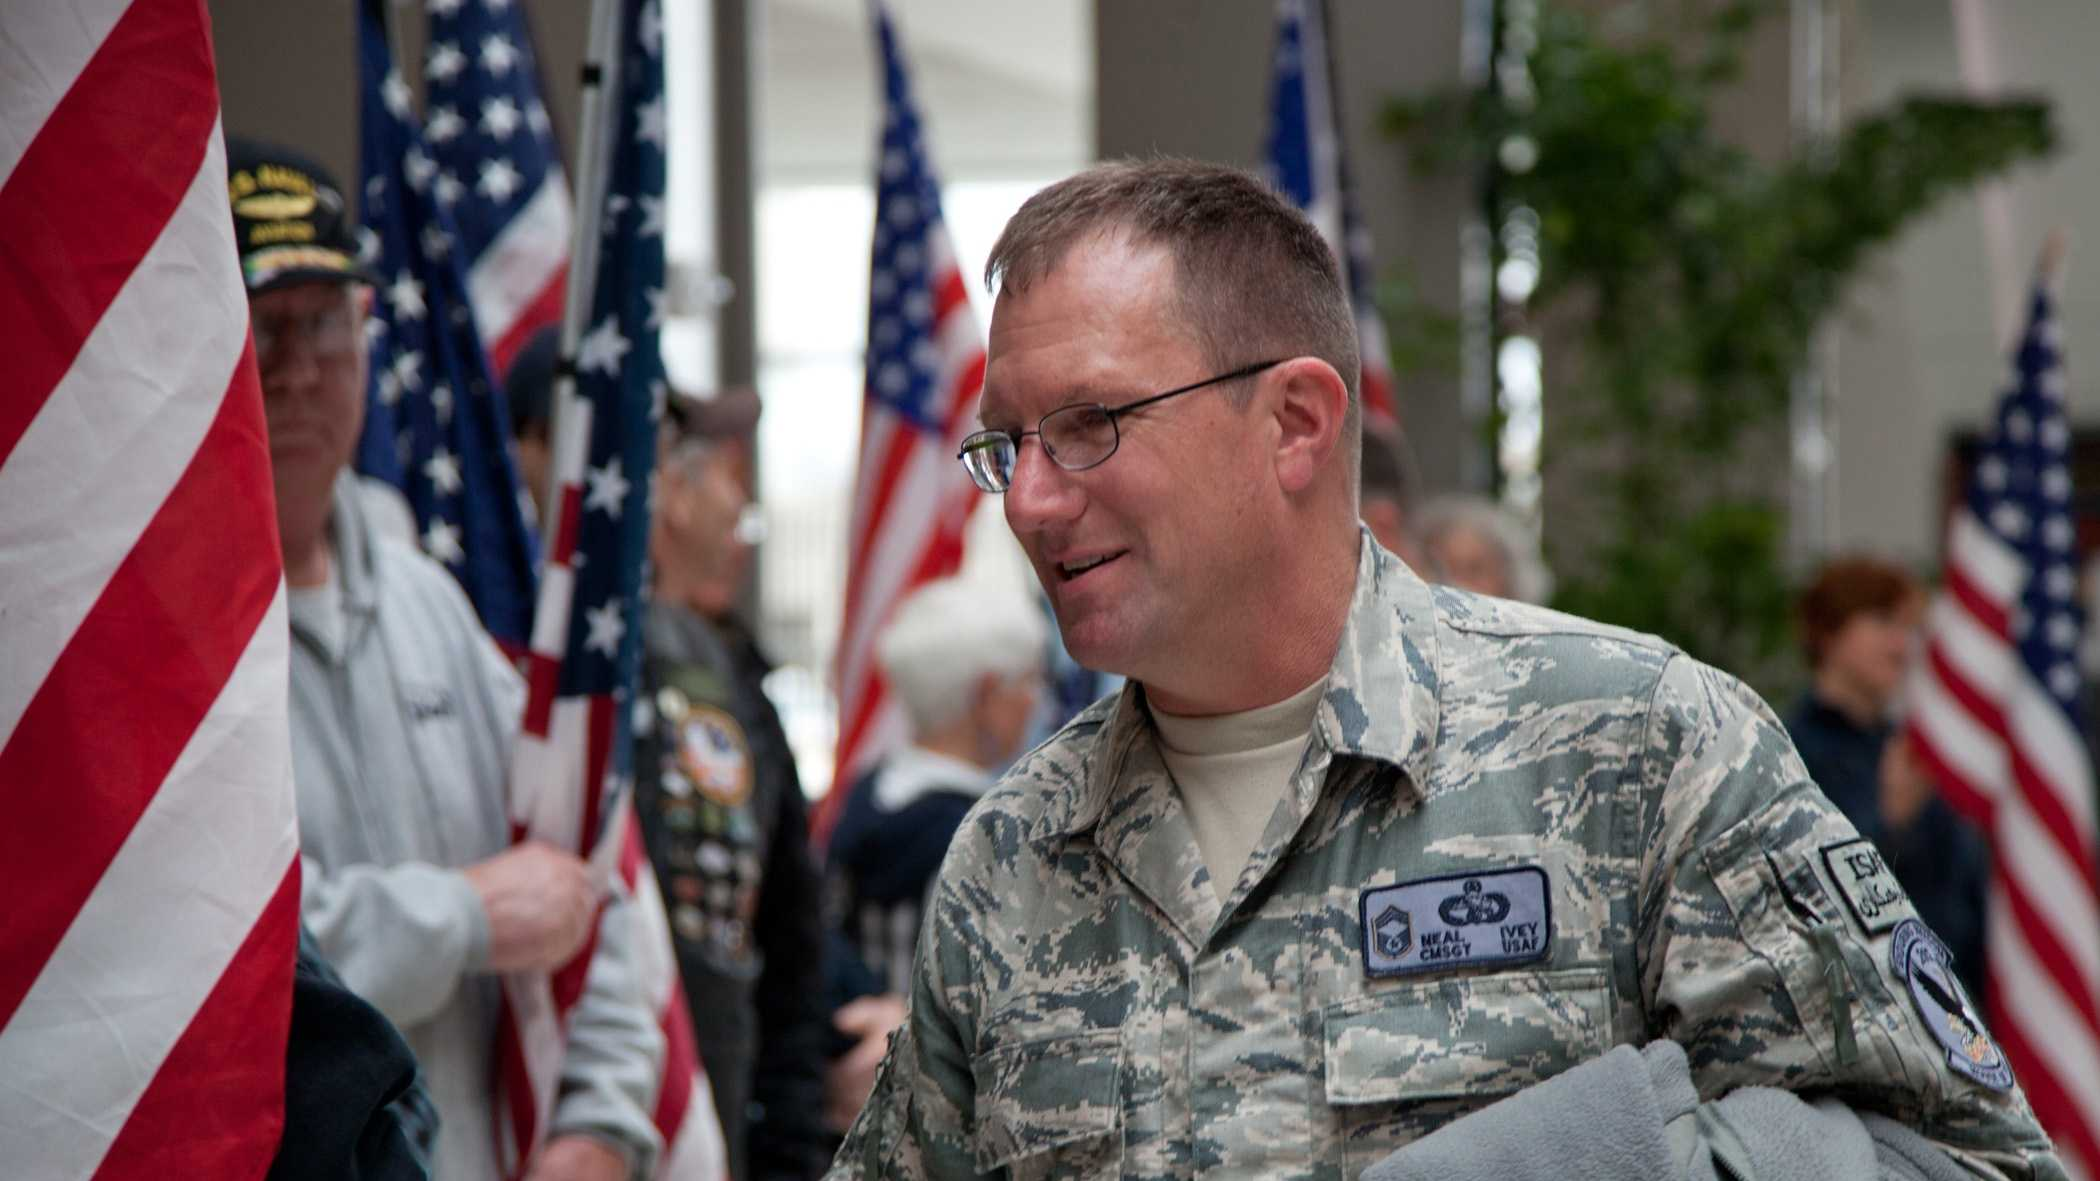 Master Sgt. Robert Neal Ivey